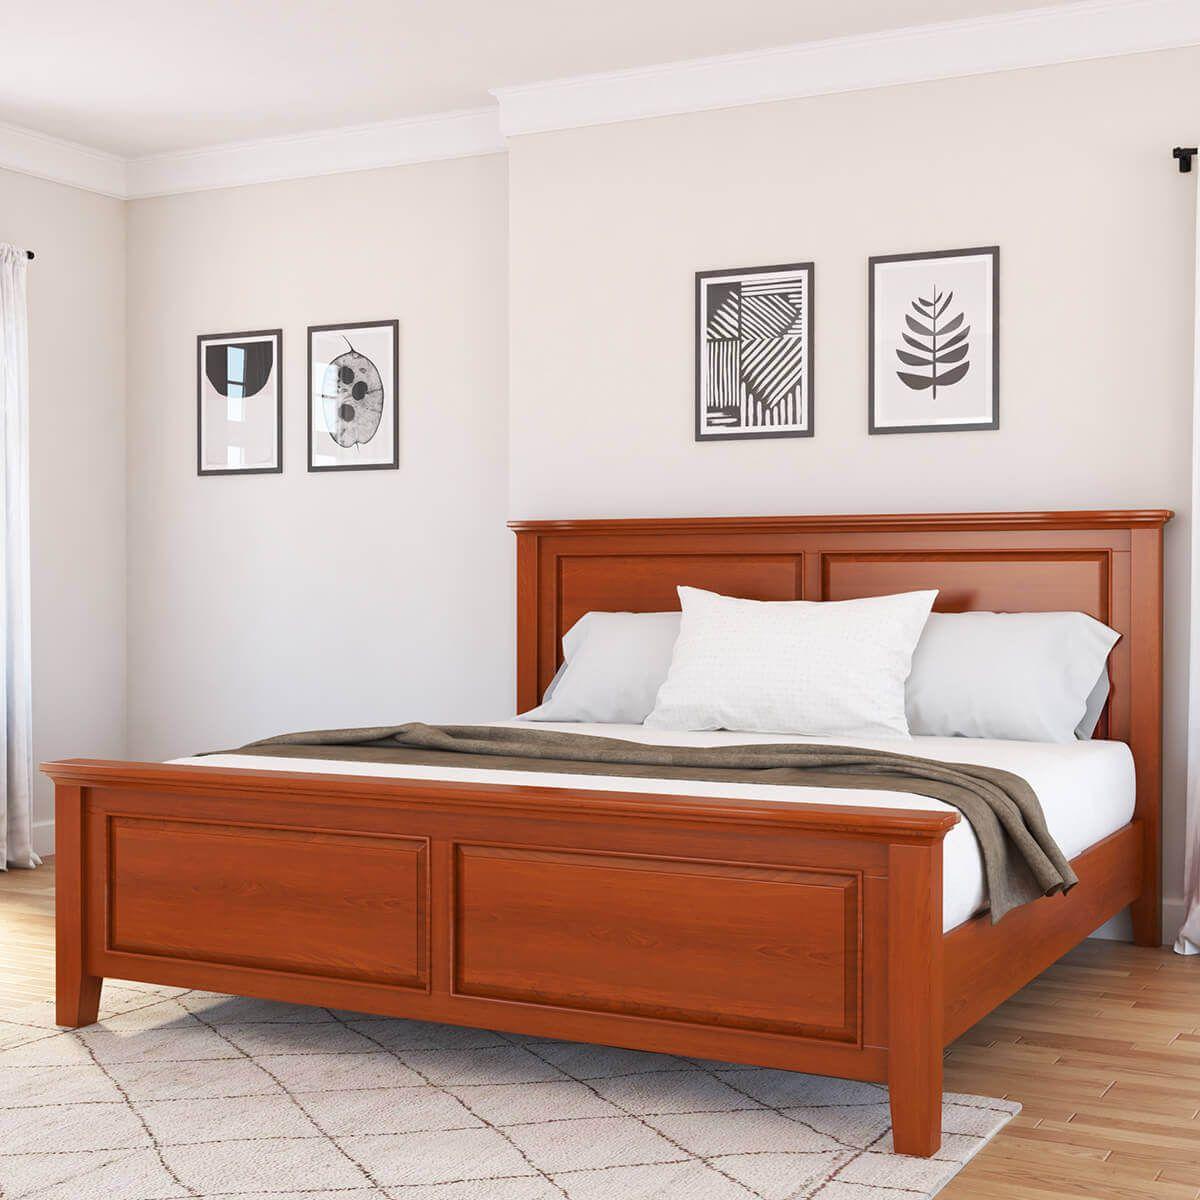 Kristoff Solid Mahogany Wood Platform Bed Wood Platform Bed Wooden Bed Design Bedroom Furniture Design